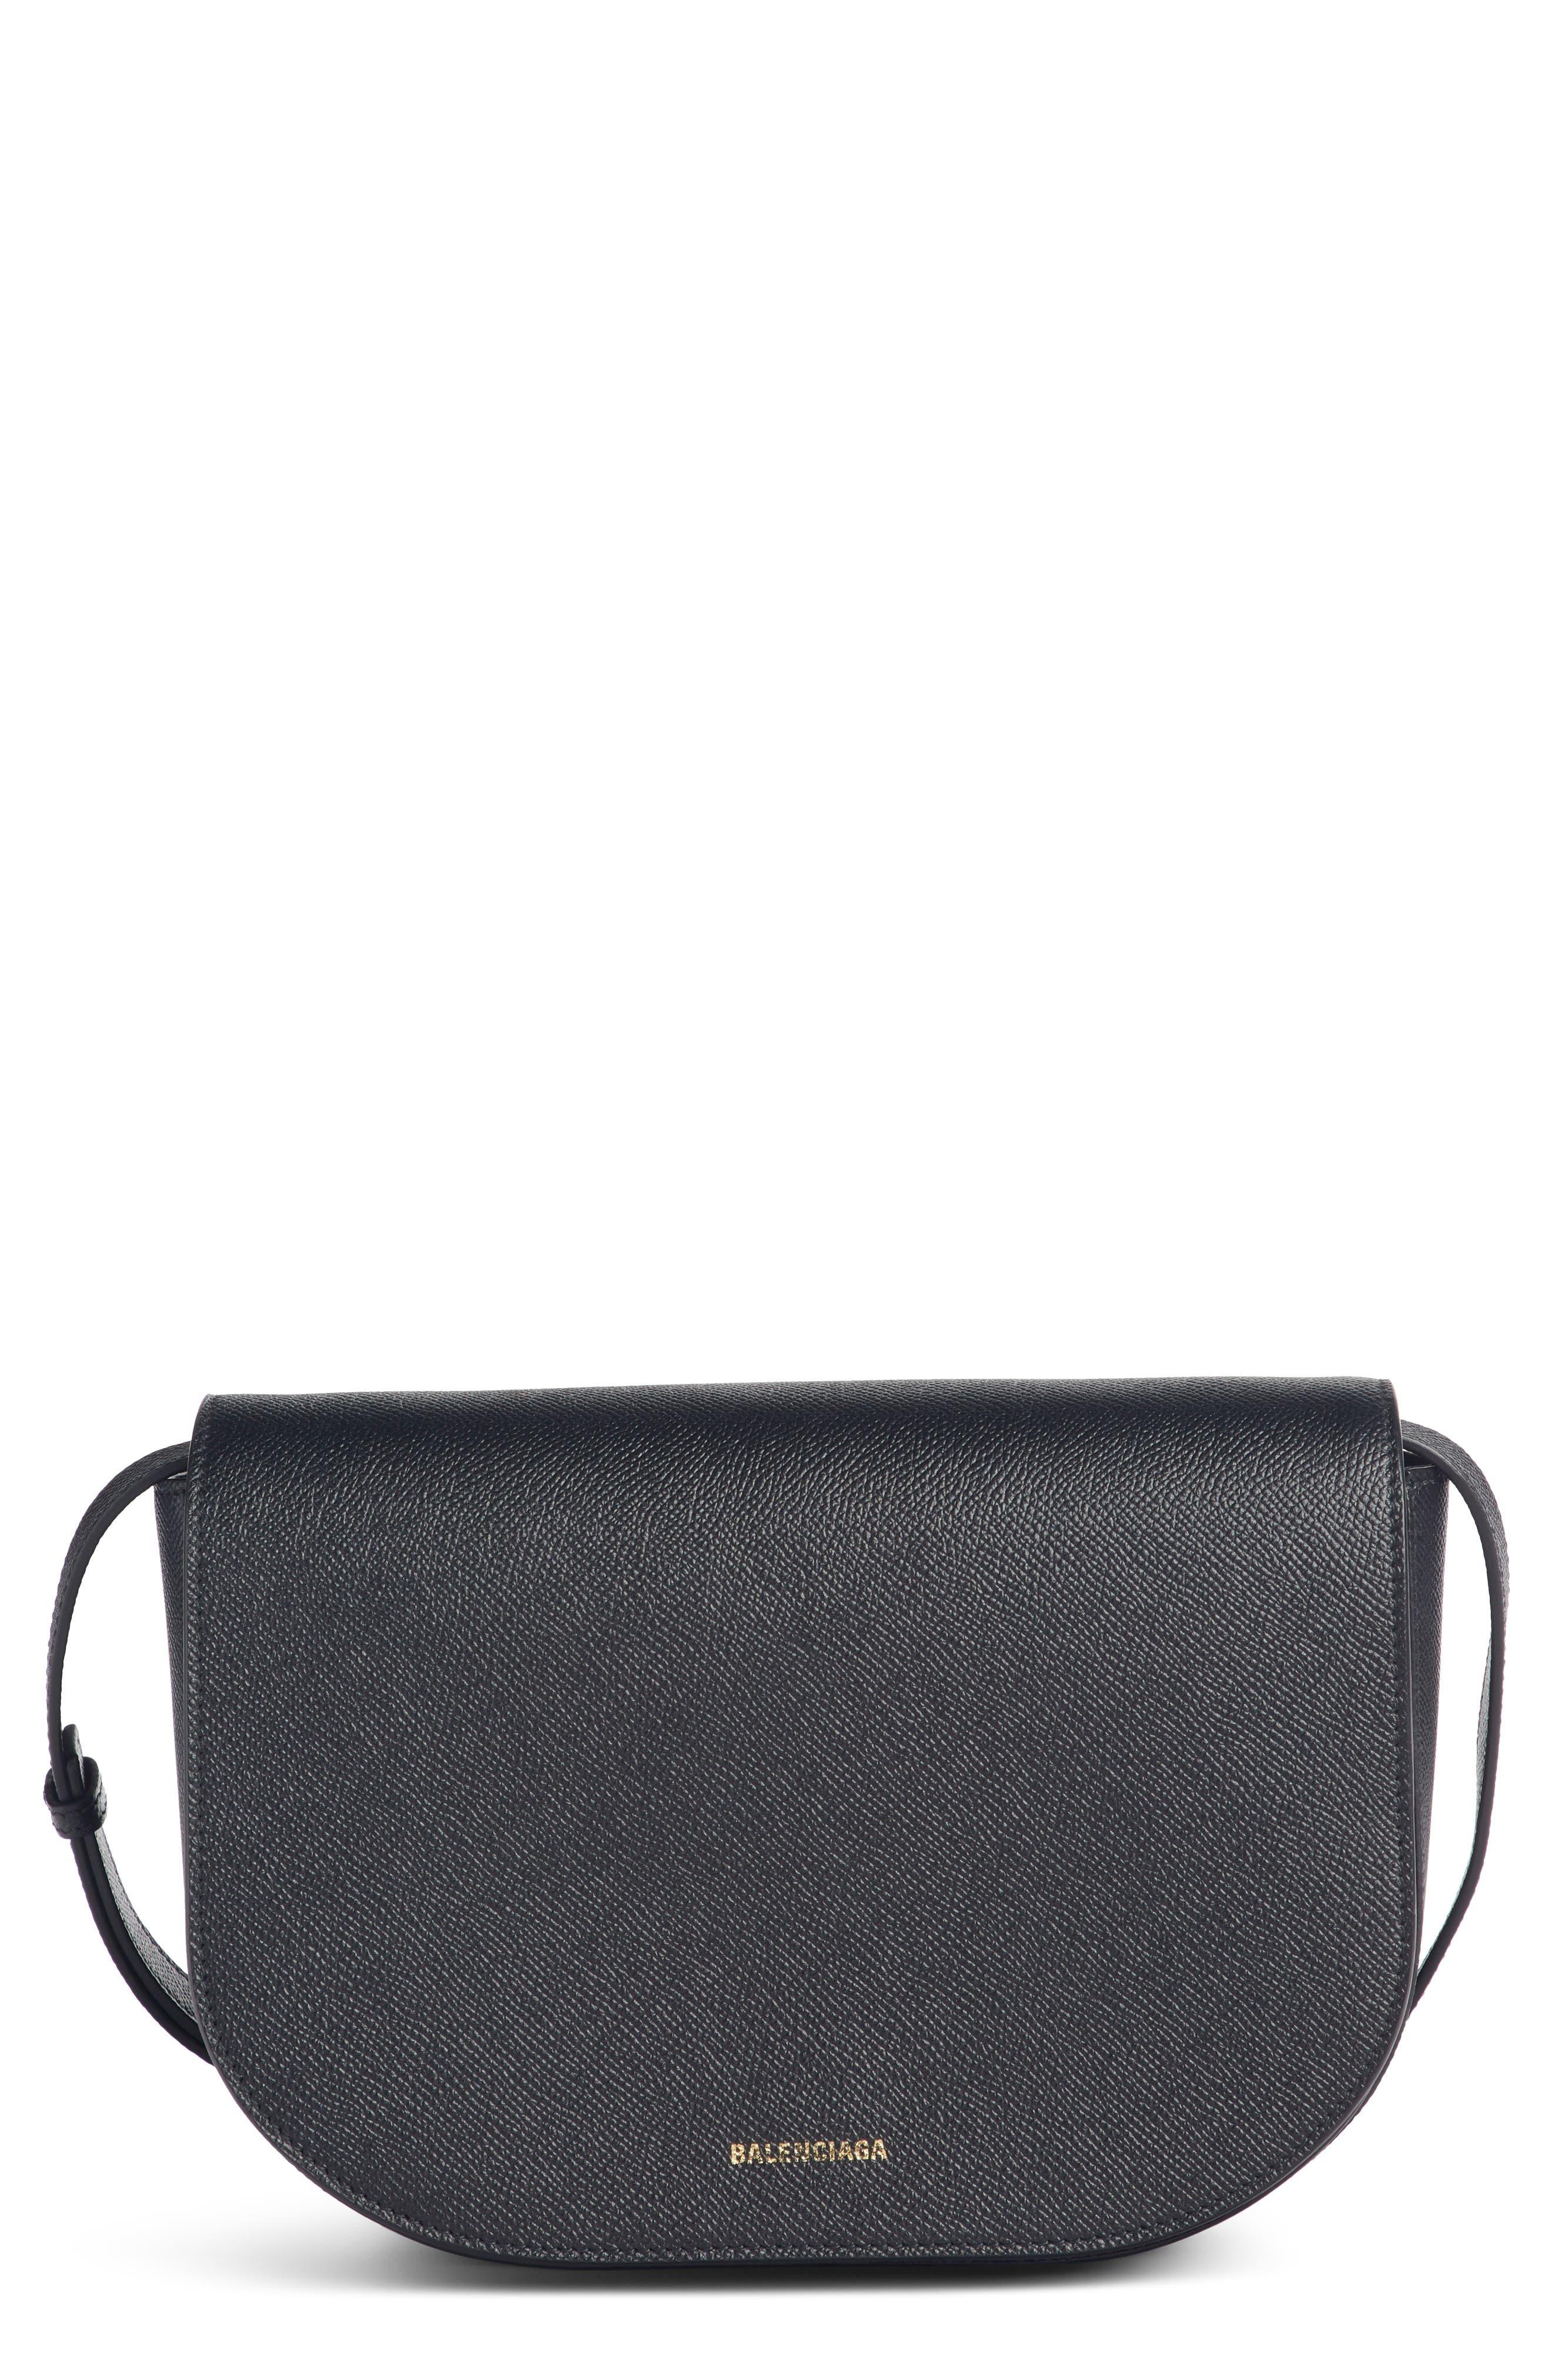 Small Ville Logo Leather Saddle Bag,                             Main thumbnail 1, color,                             NOIR/ BLANC